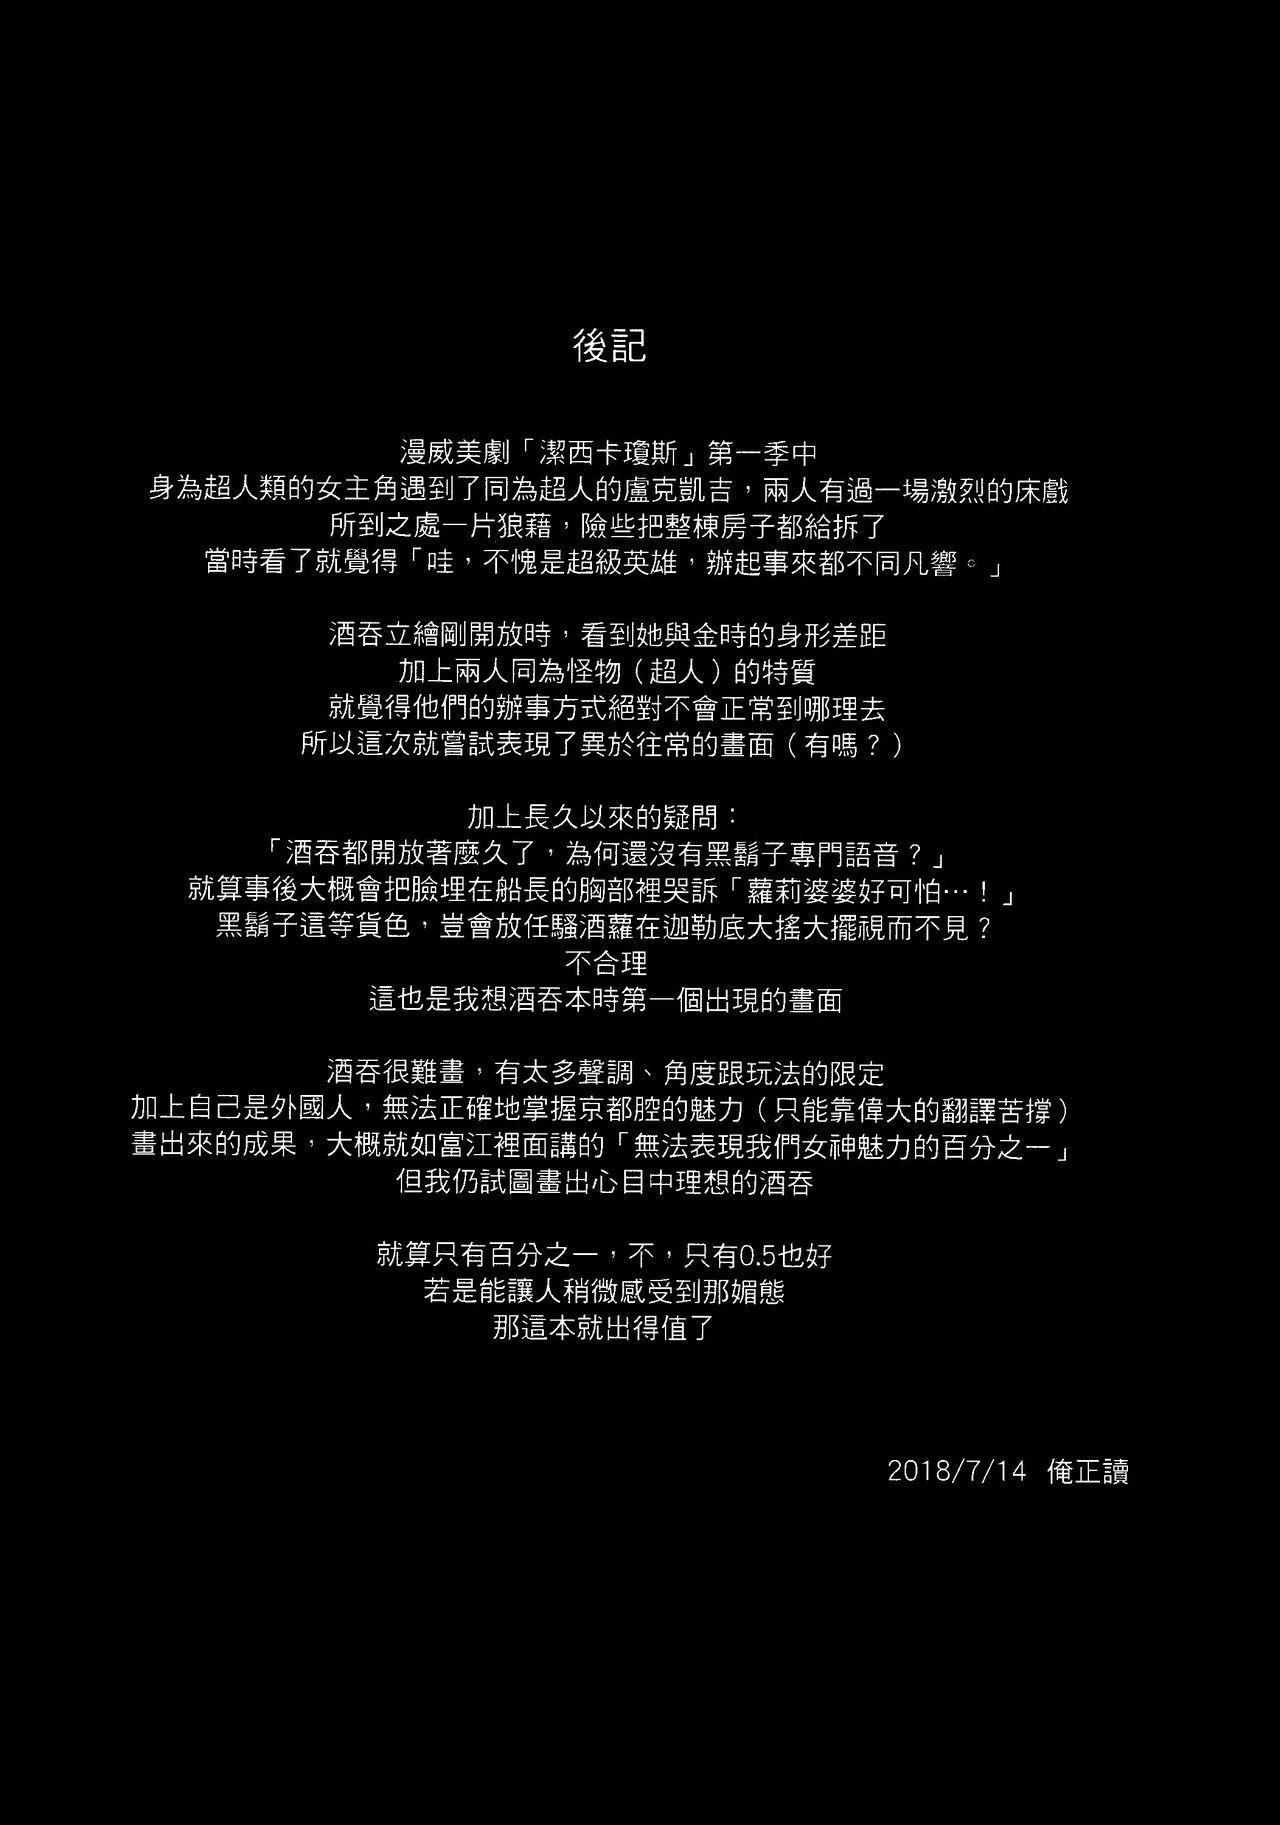 CHALDEA MANIA - Shuten Douji 23